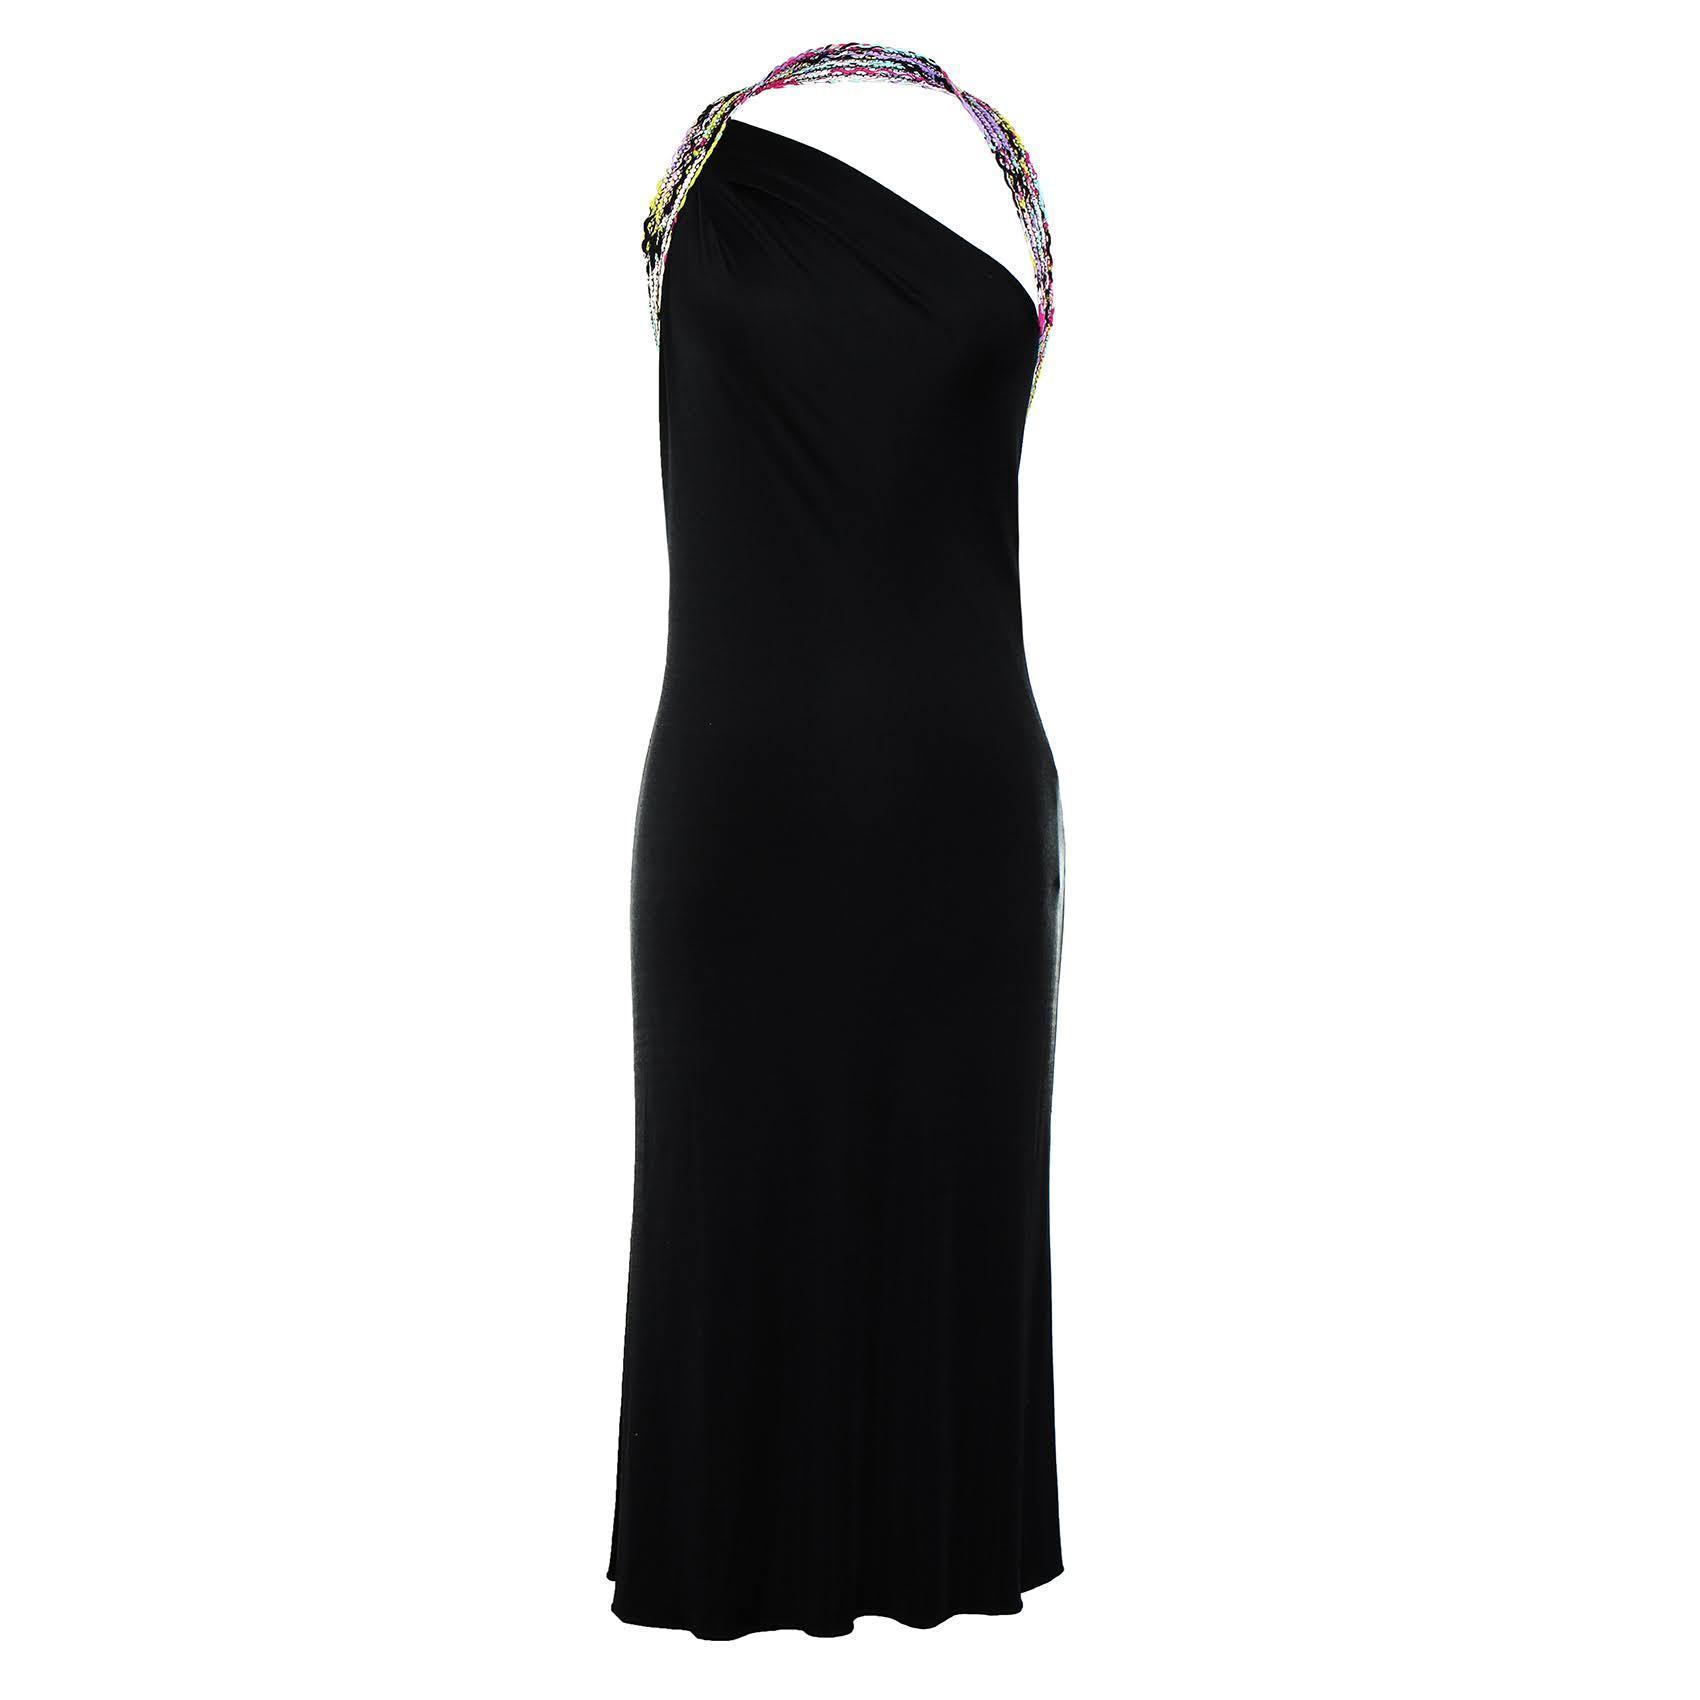 Emilio Pucci Size 40 Black Halter Braided Trim Silk Dress